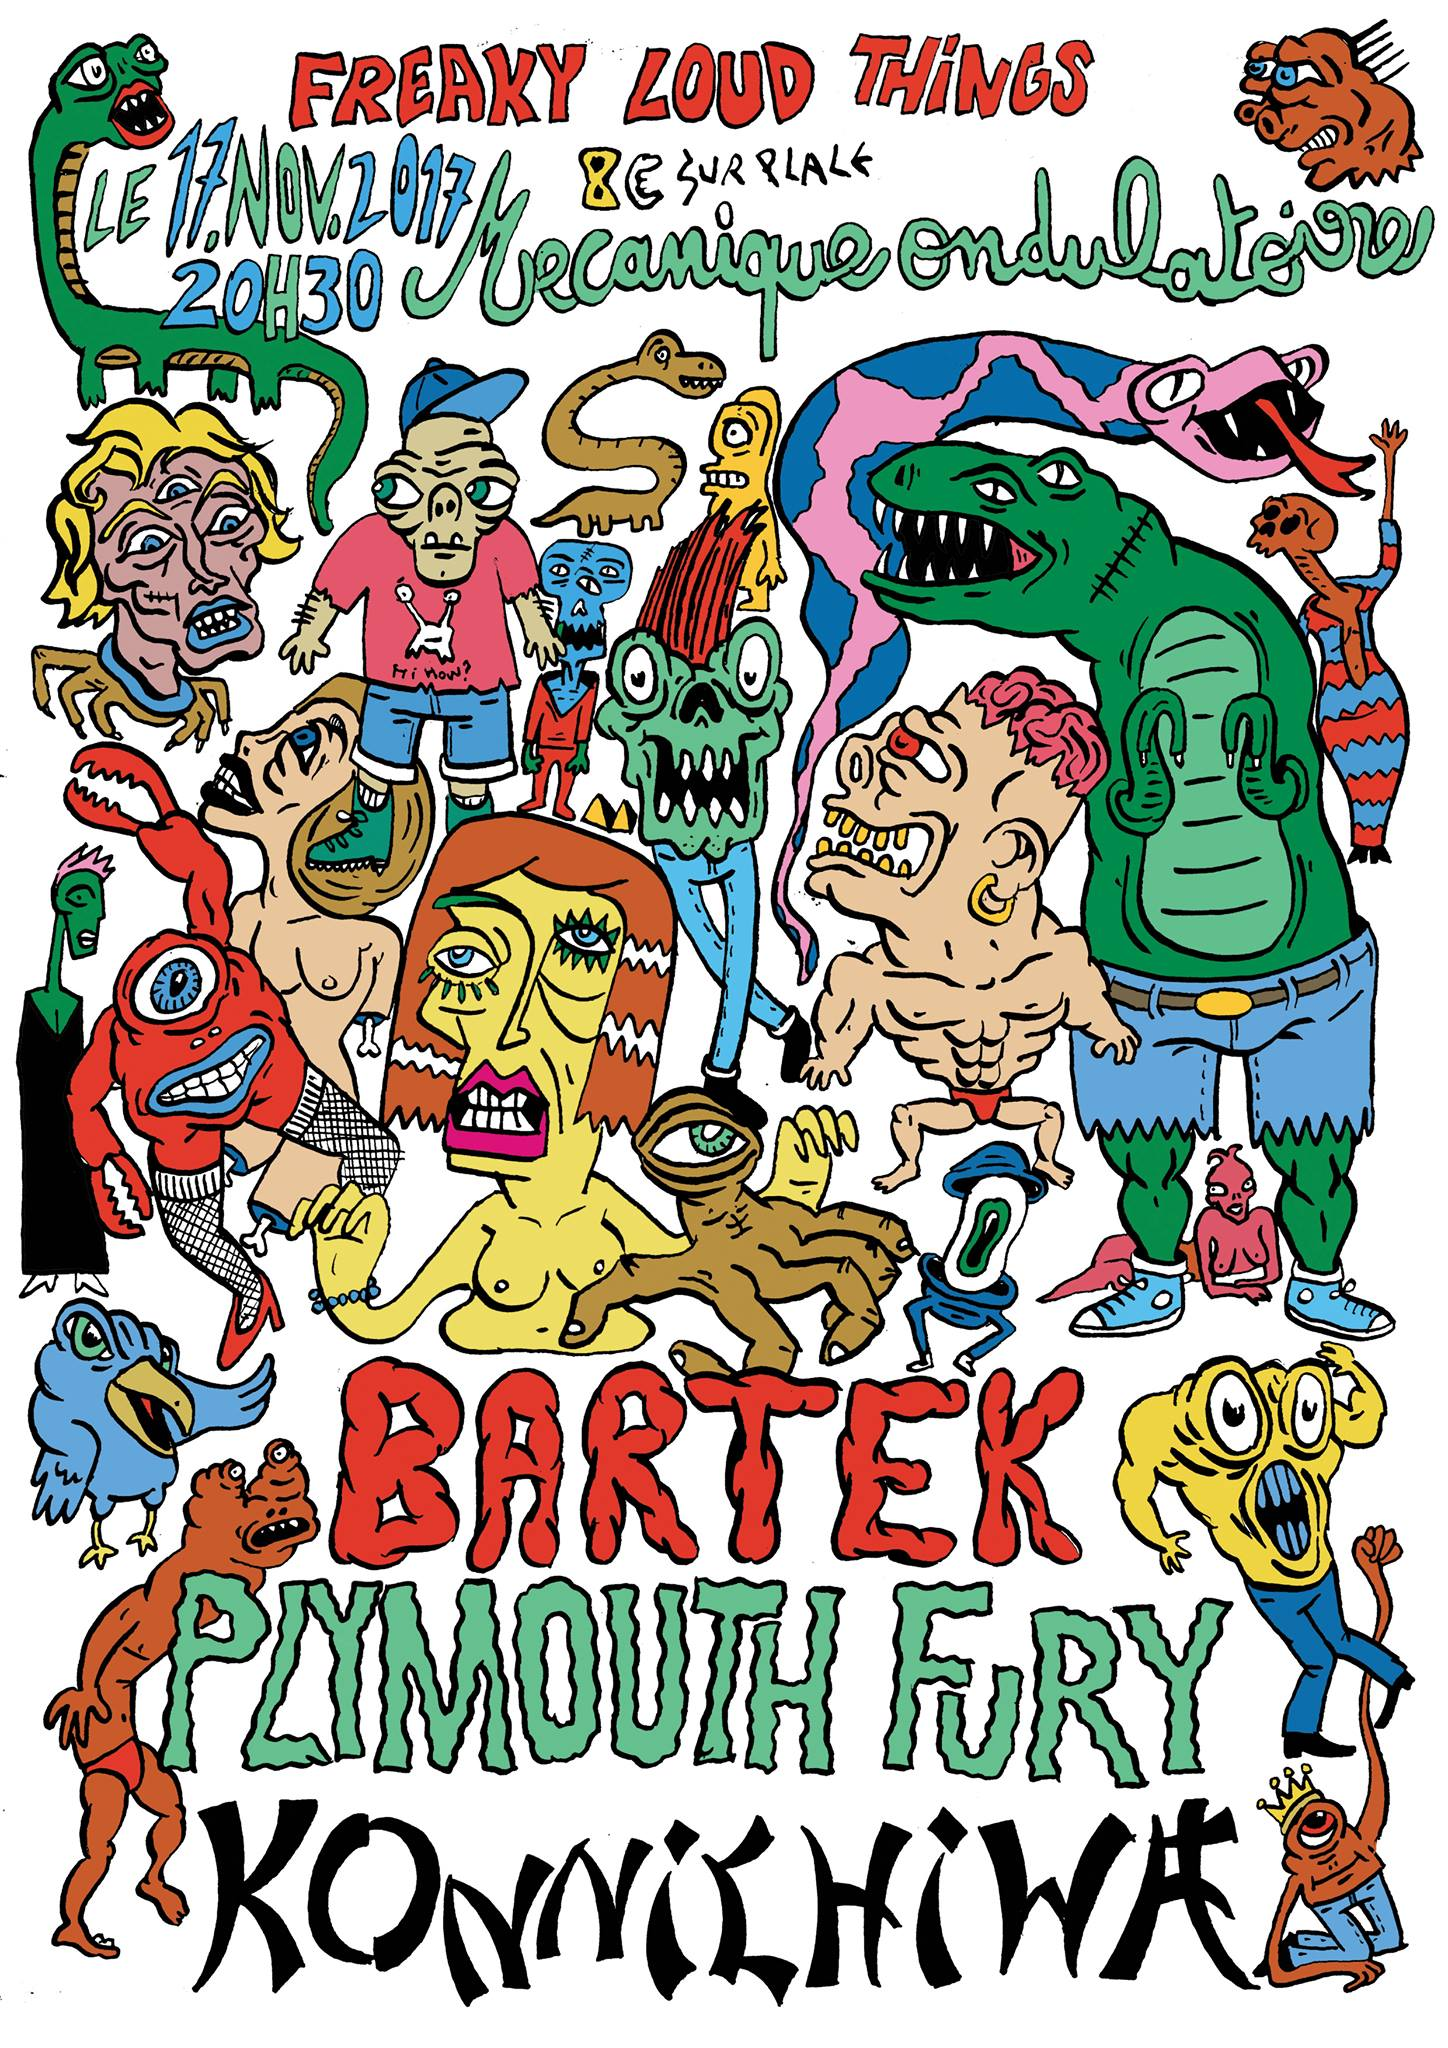 BARTEK + PLYMOUTH FURY + KONICHIWA // 17.11